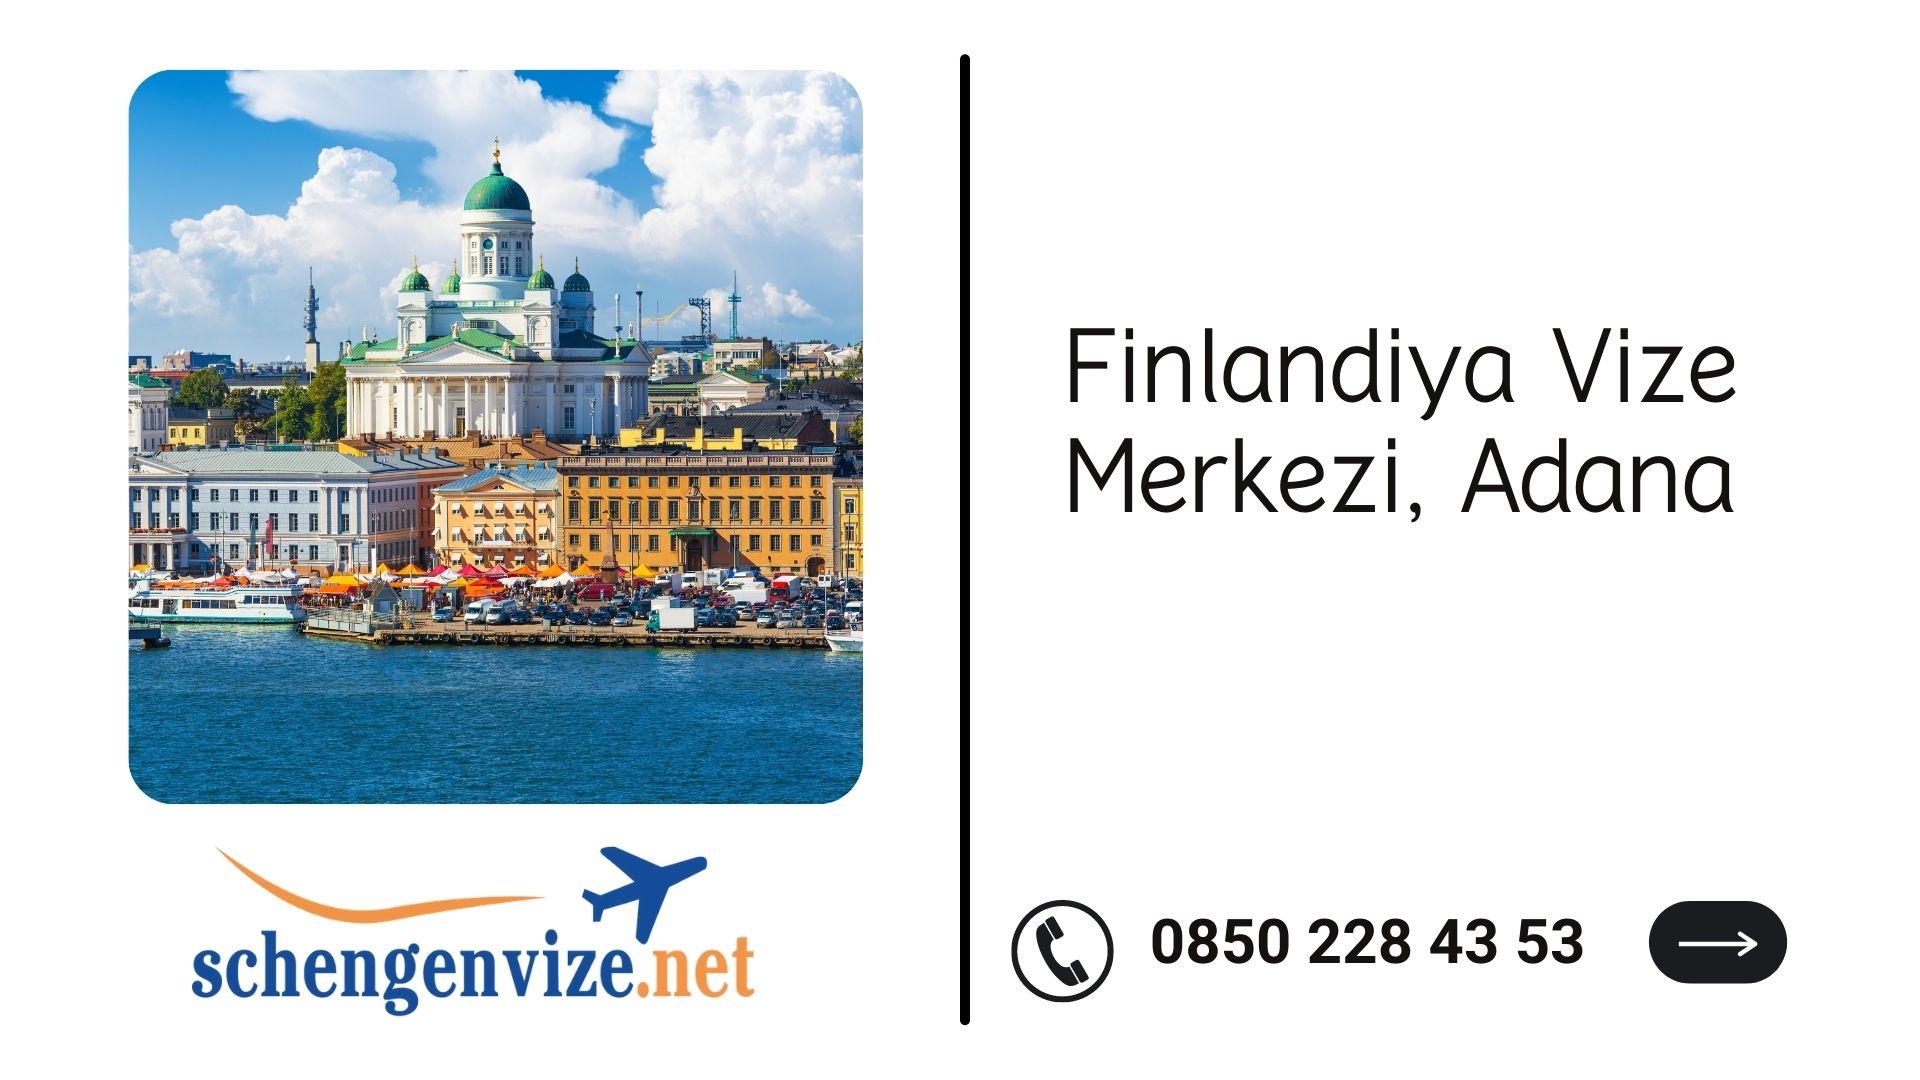 Finlandiya Vize Merkezi, Adana